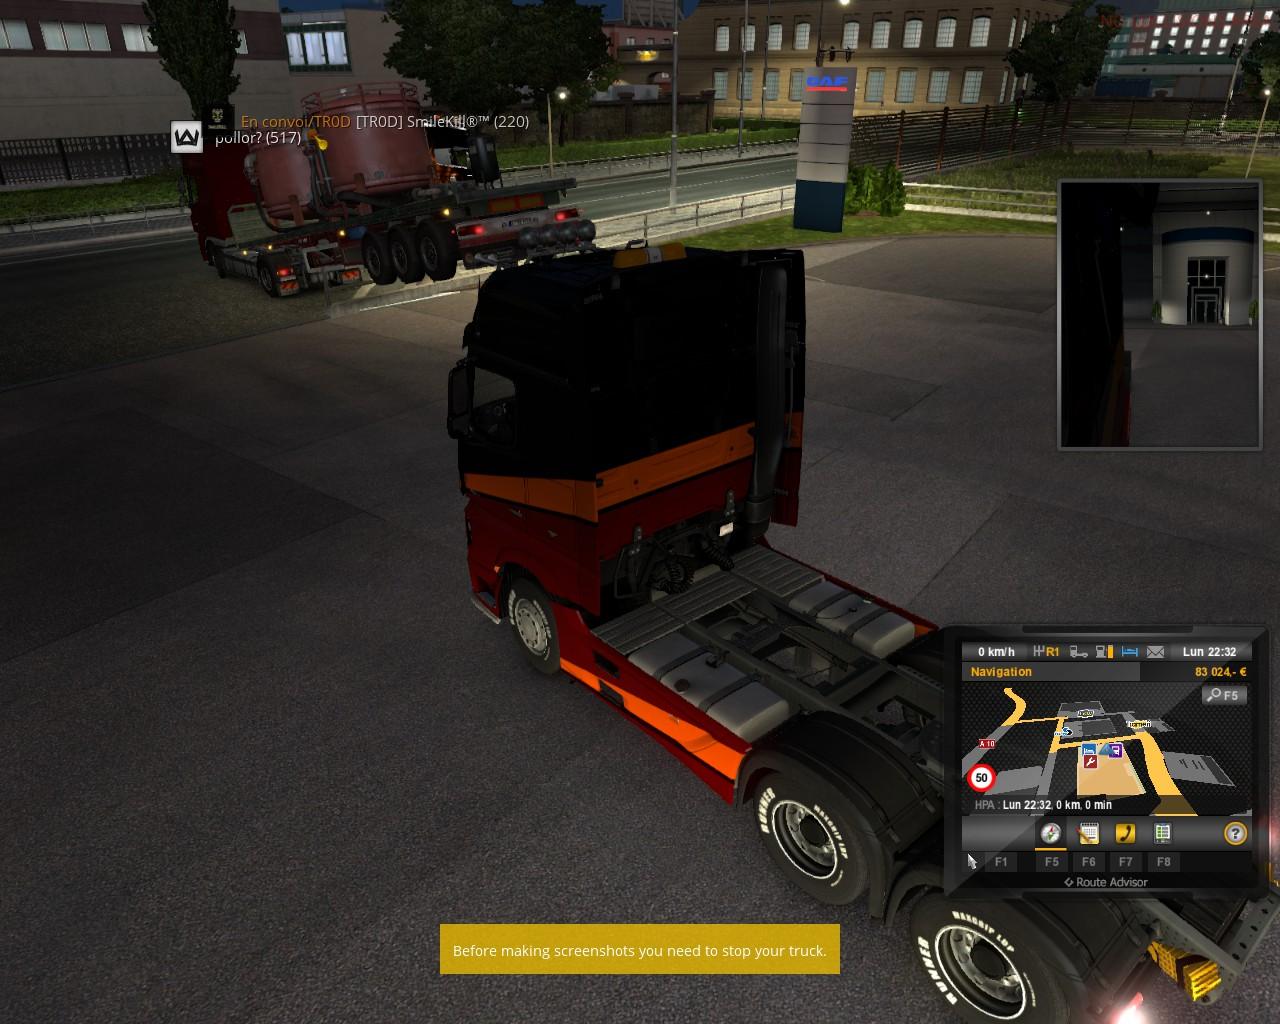 Dégage ton camion !!! 57CFF6F19DFB90731CB58D29A6C5FC99F2D5CC4F